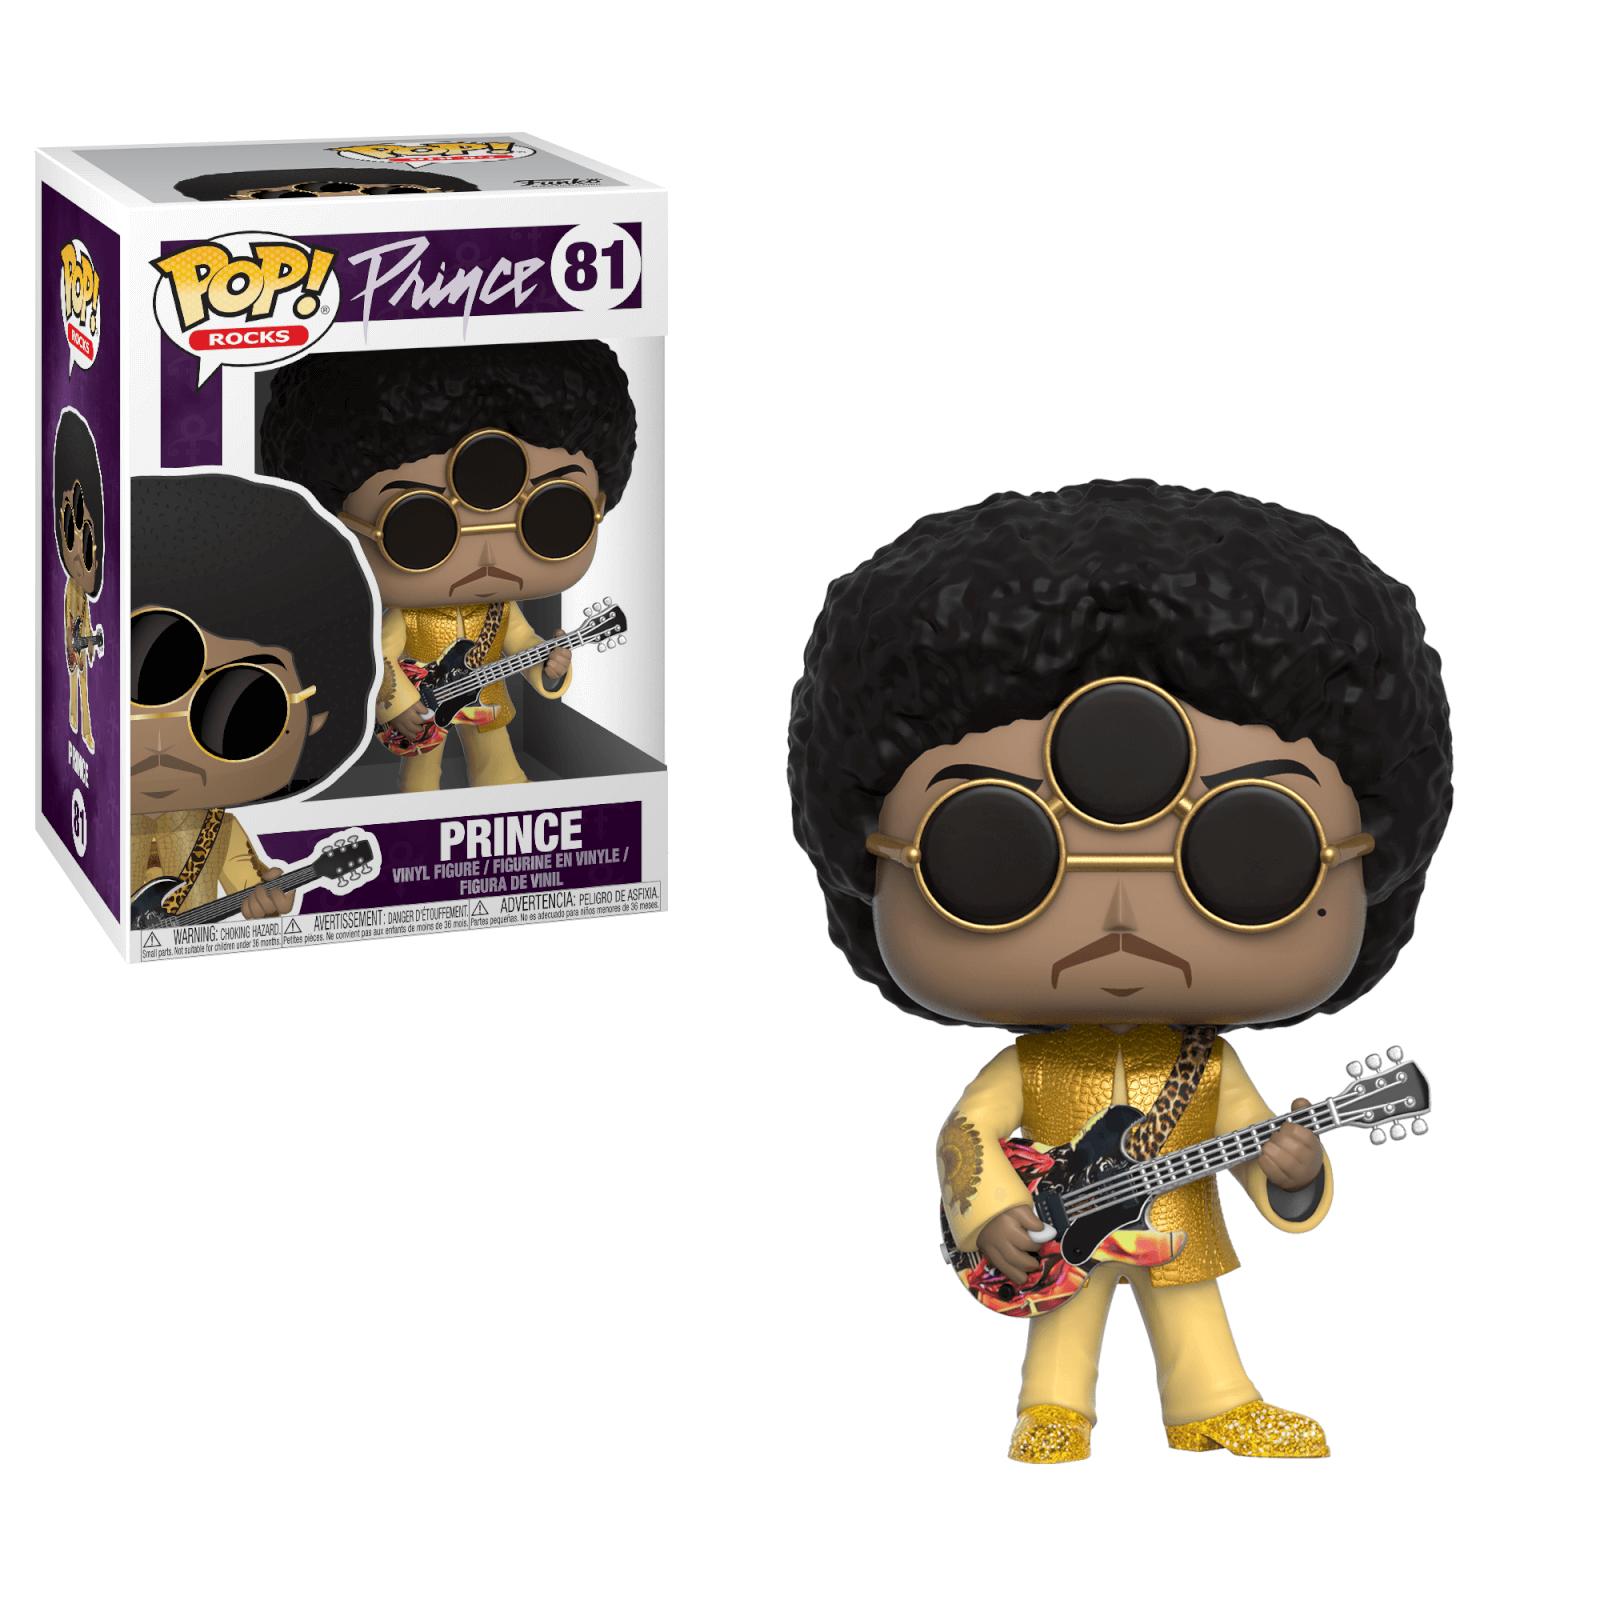 Pop! Rocks Prince 3rd Eye Girl Pop! Vinyl Figure